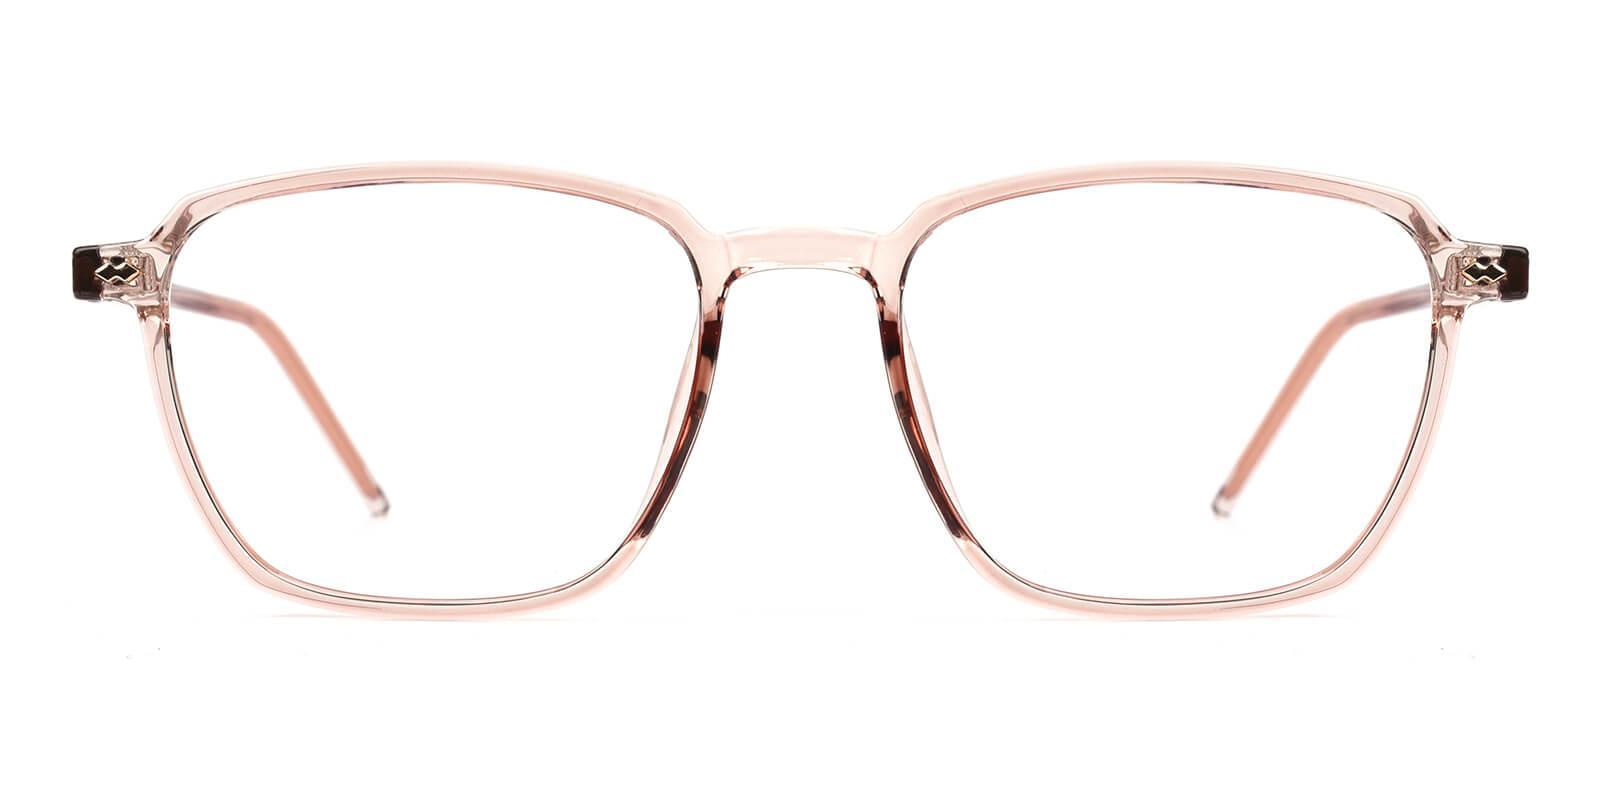 Rolita-Pink-Square-Acetate / TR-Eyeglasses-additional2